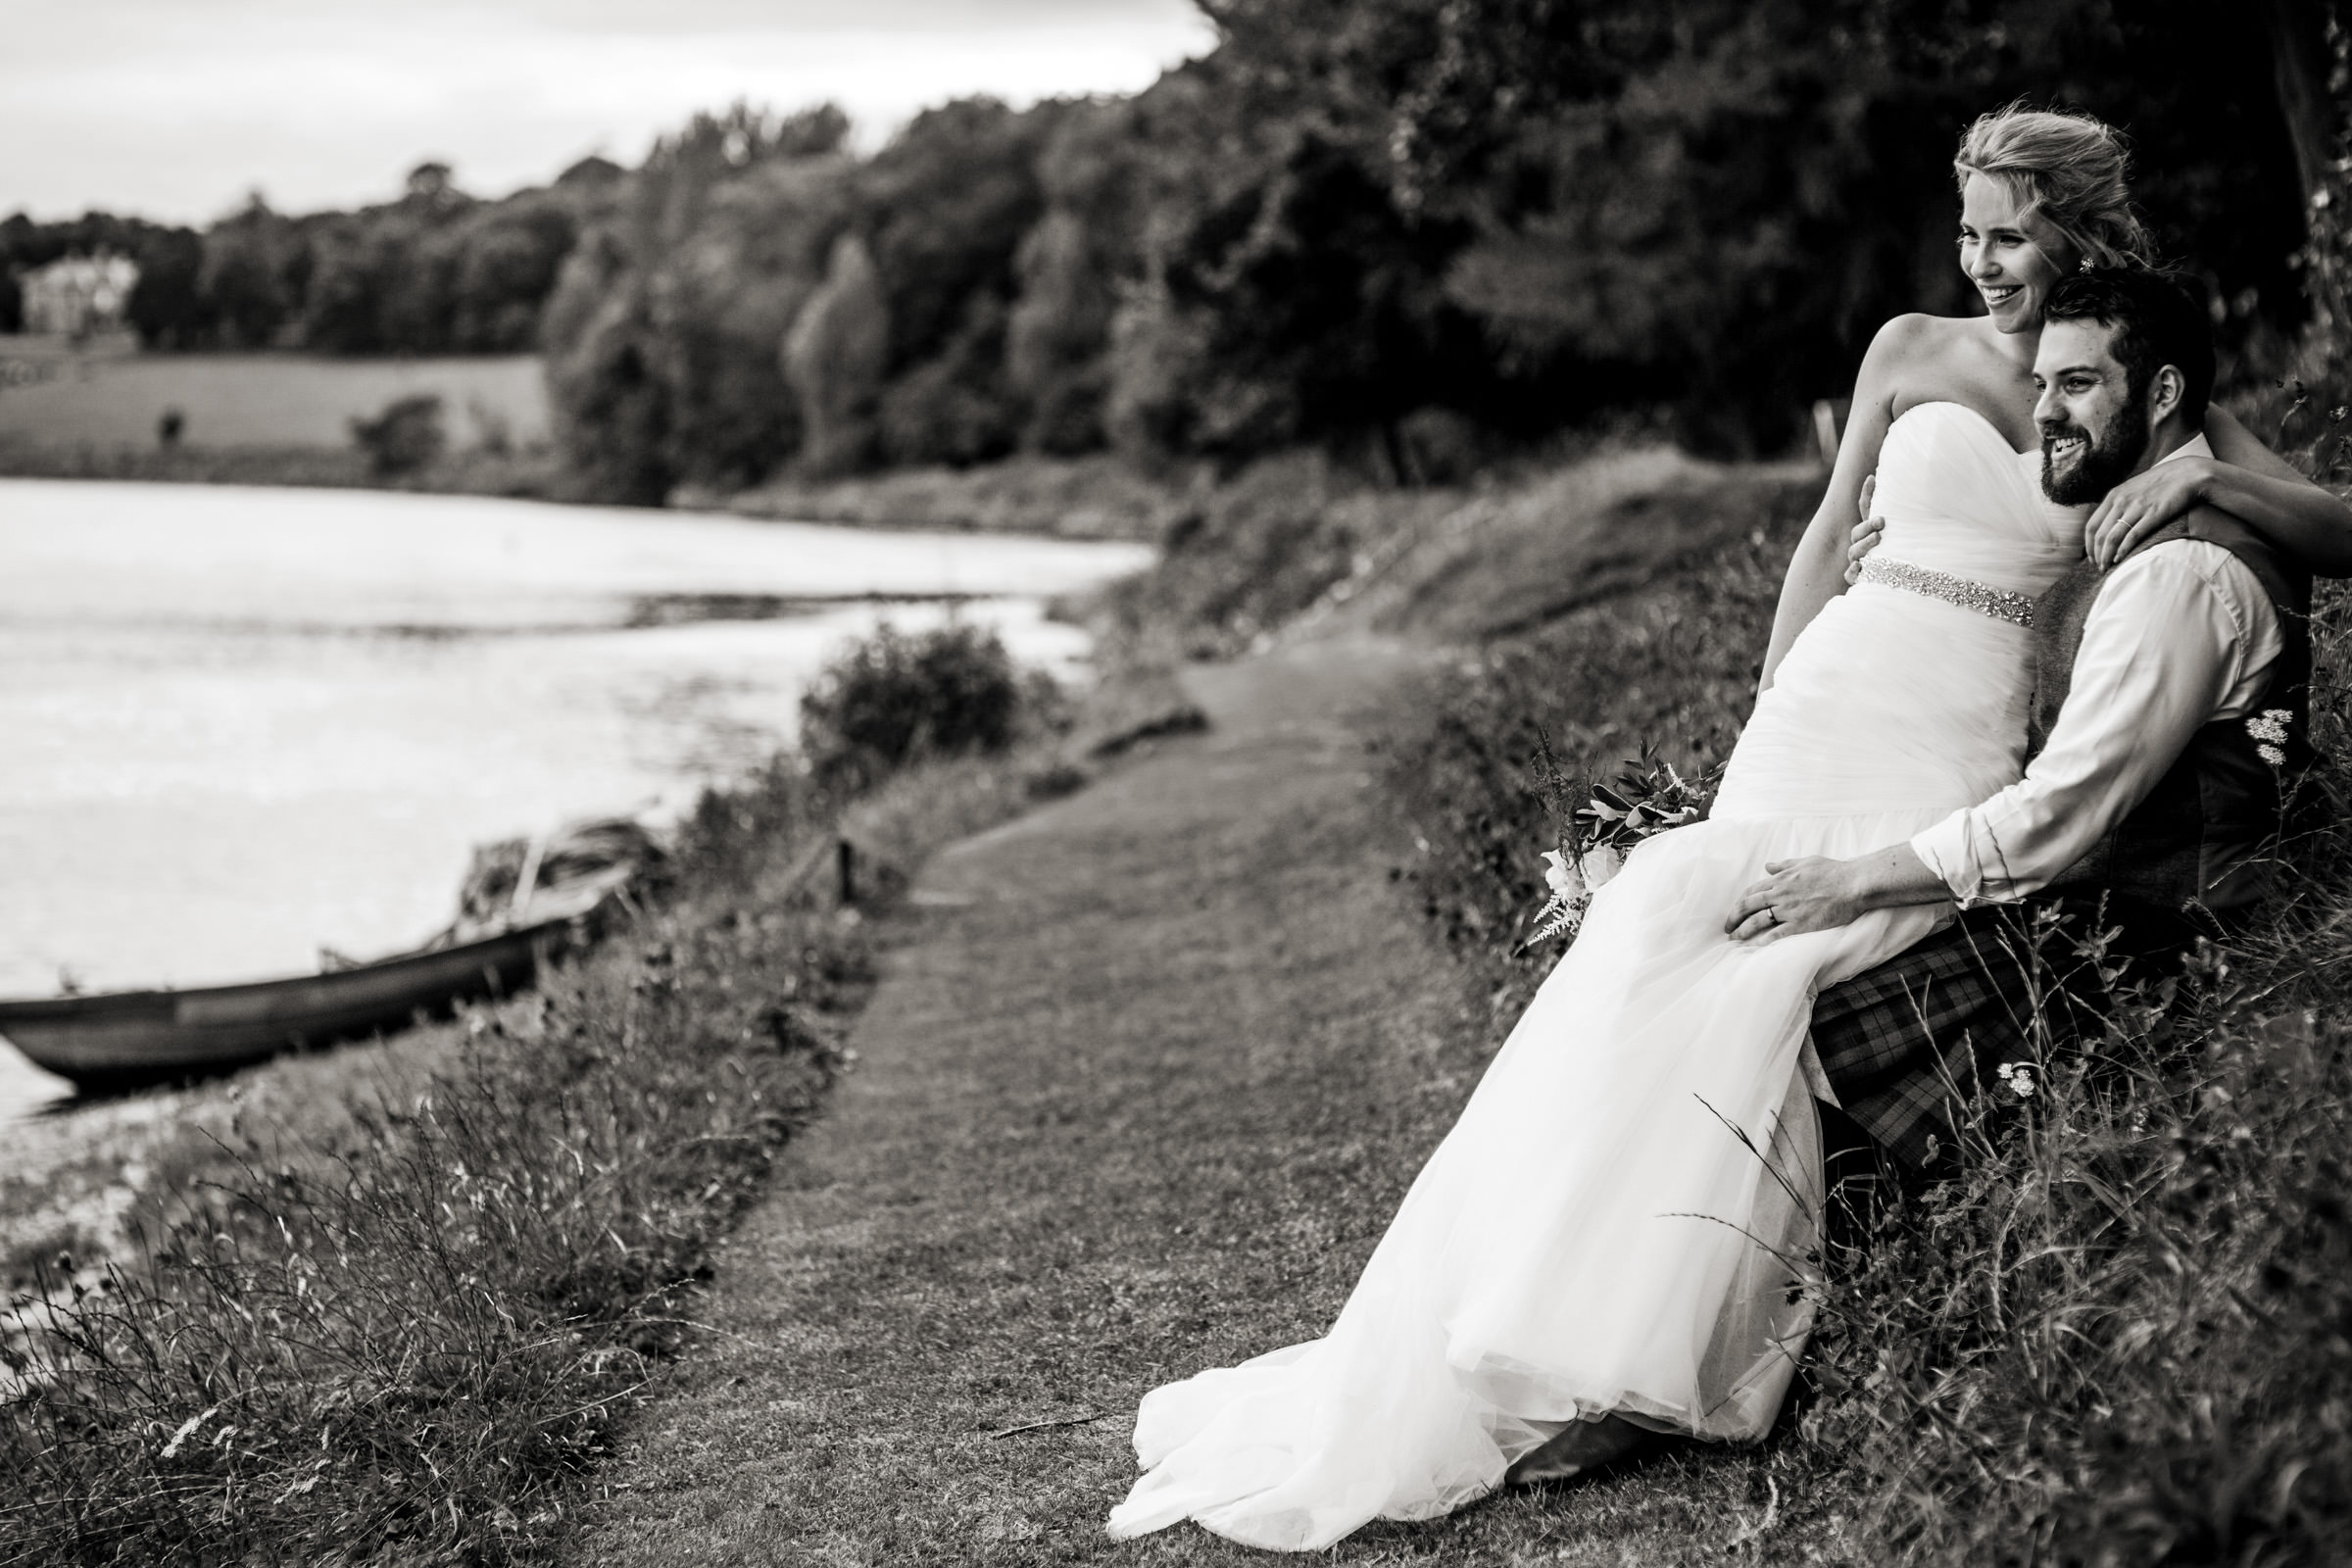 Documentart wedding photographers Berwick-upon-Tweed 014.jpg